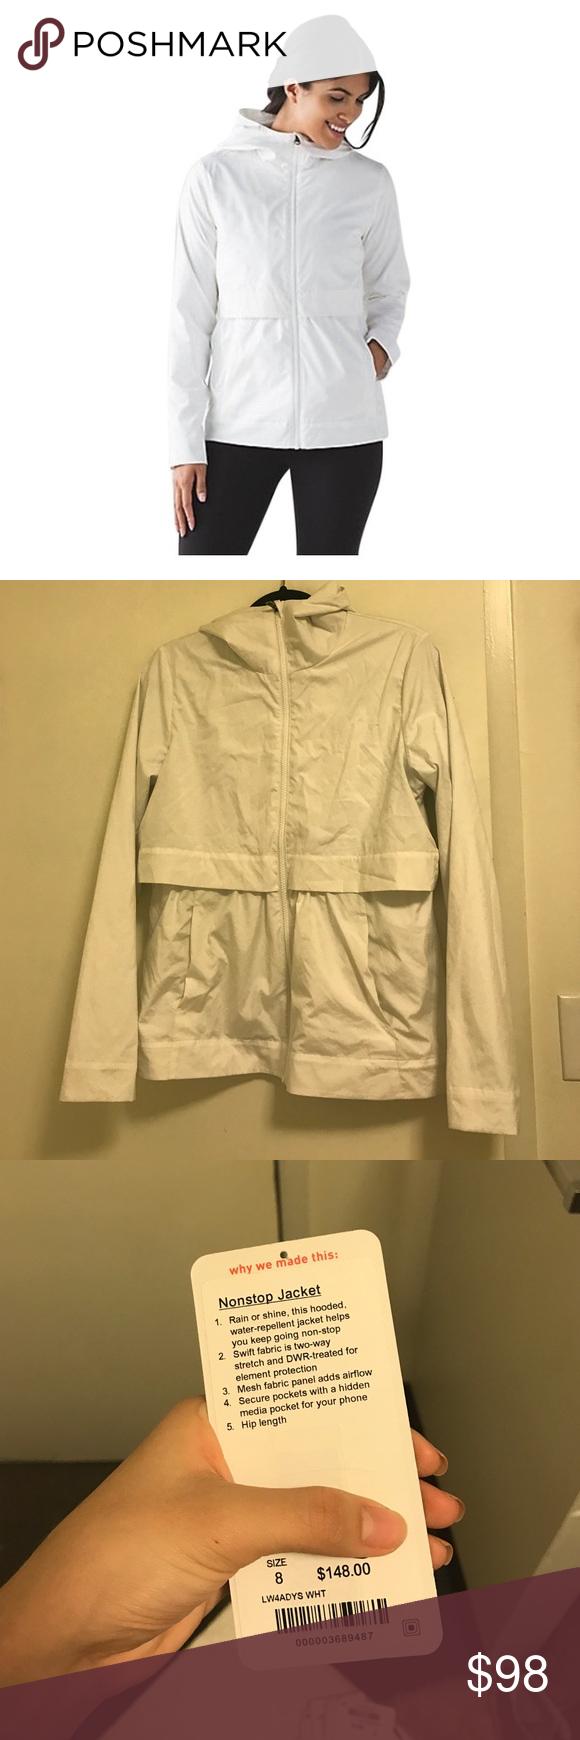 Nonstop jacket lululemon Worn like once just not my size. lululemon athletica Jackets & Coats